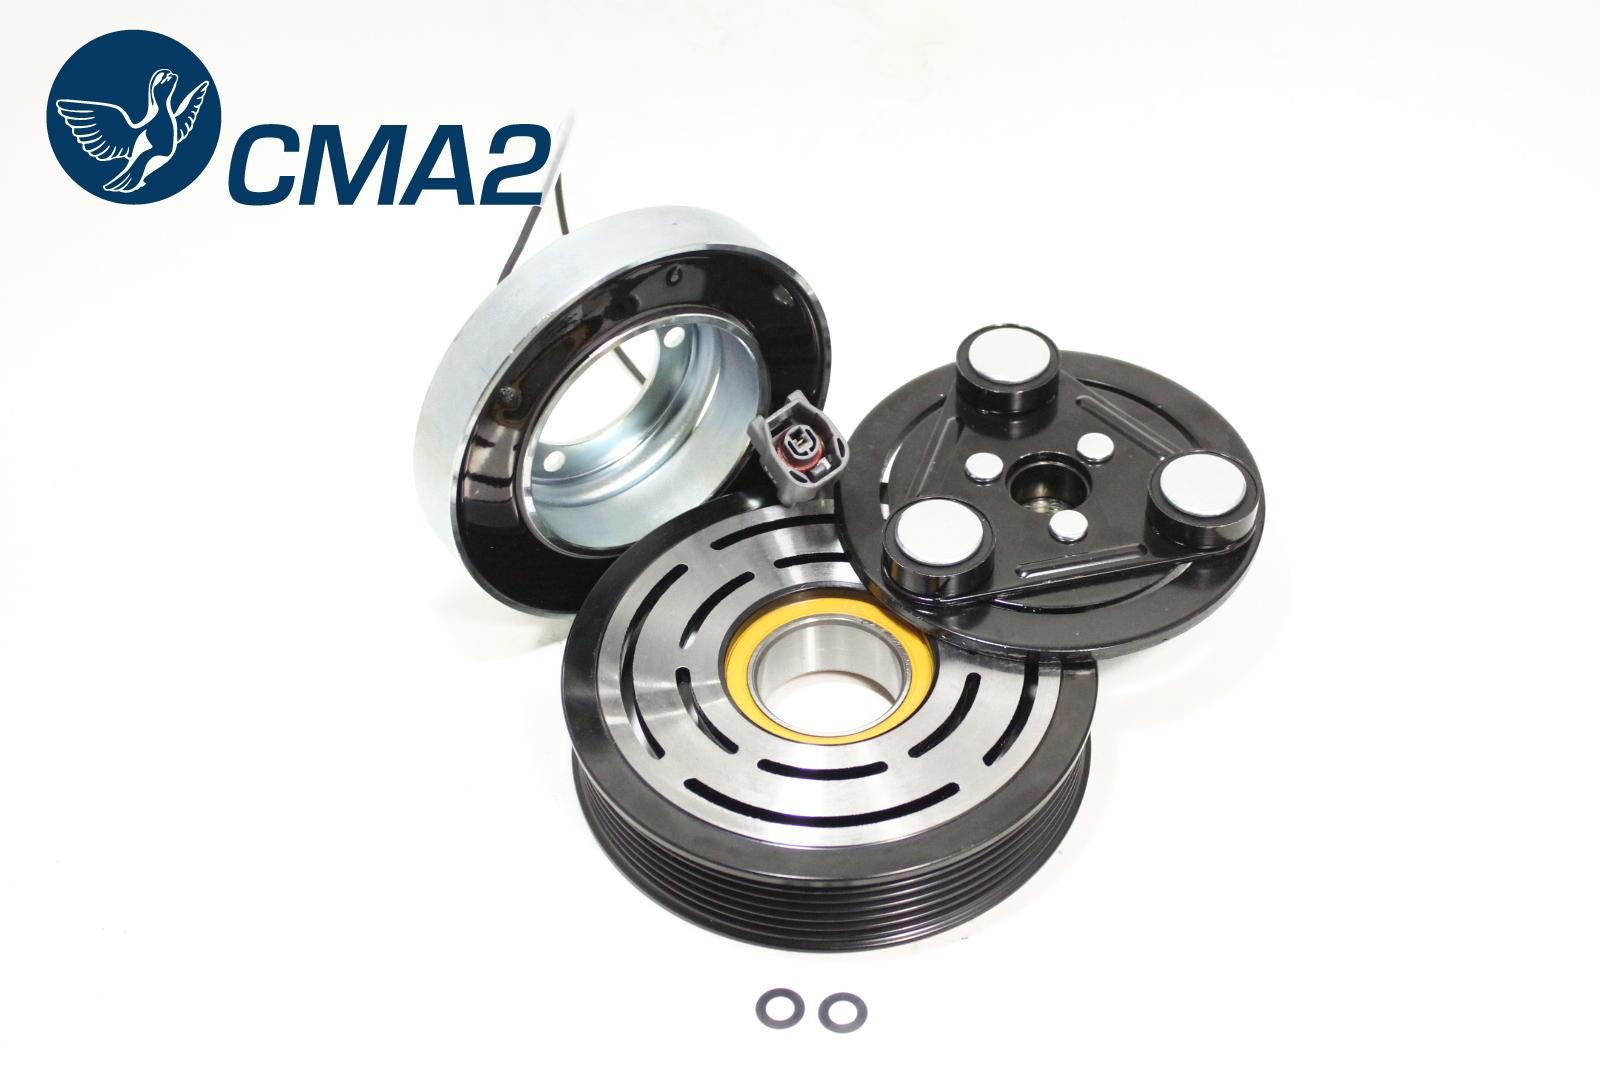 Муфта компрессора кондиционера Мазда 6 GG GJ6A-61-L30 GR1A-61-L30 GJ6A61L30 GR1A61L30